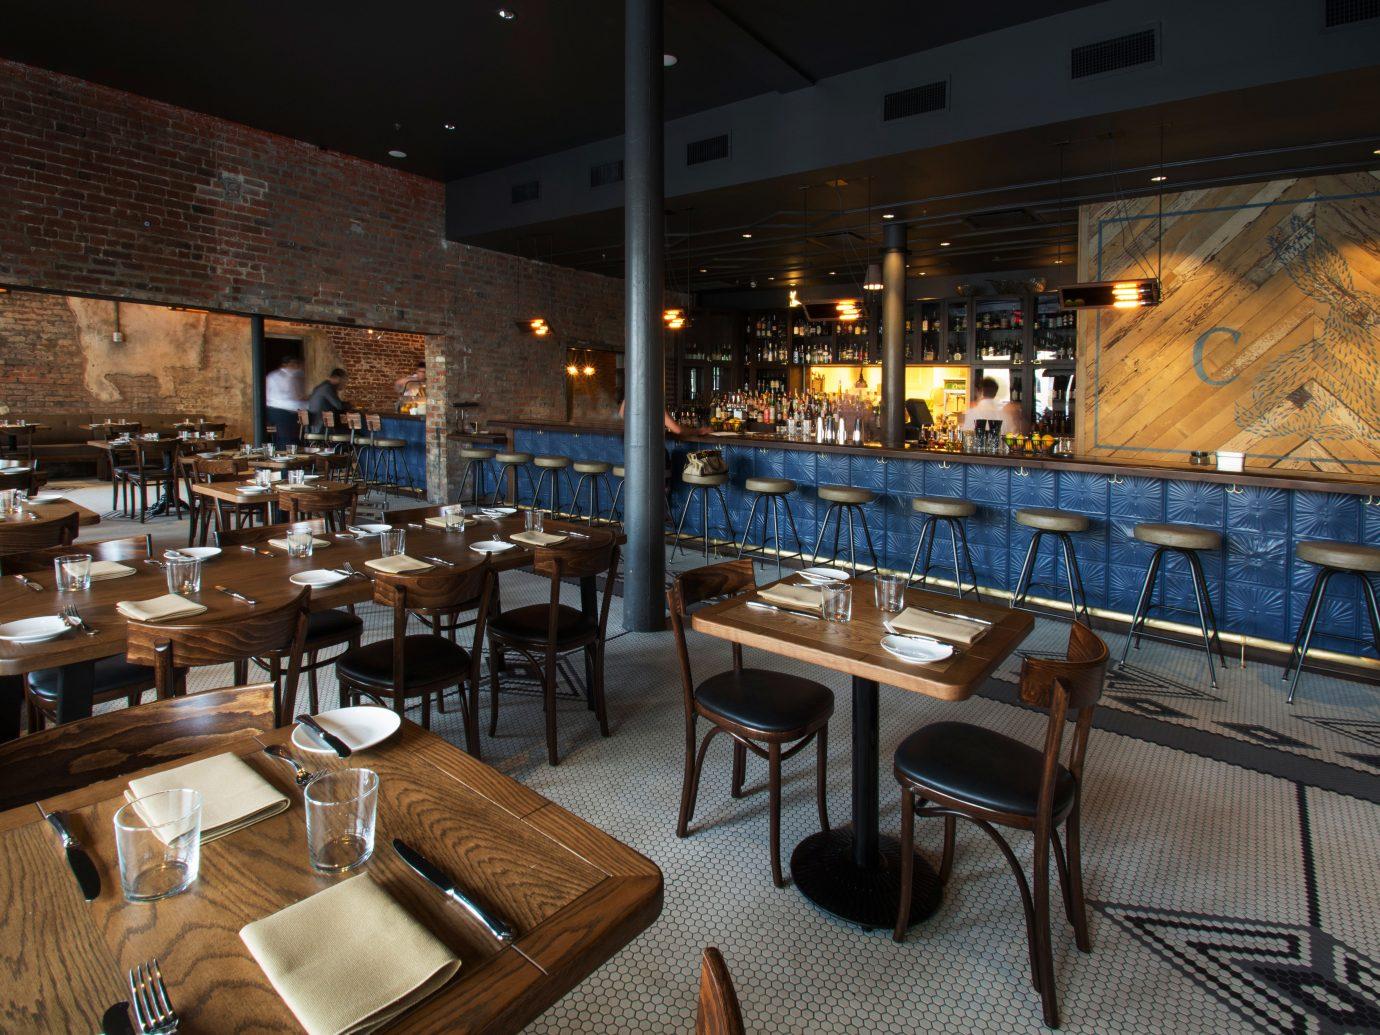 Bar Dining Drink Eat Hotels Luxury table indoor floor meal restaurant café interior design several dining room